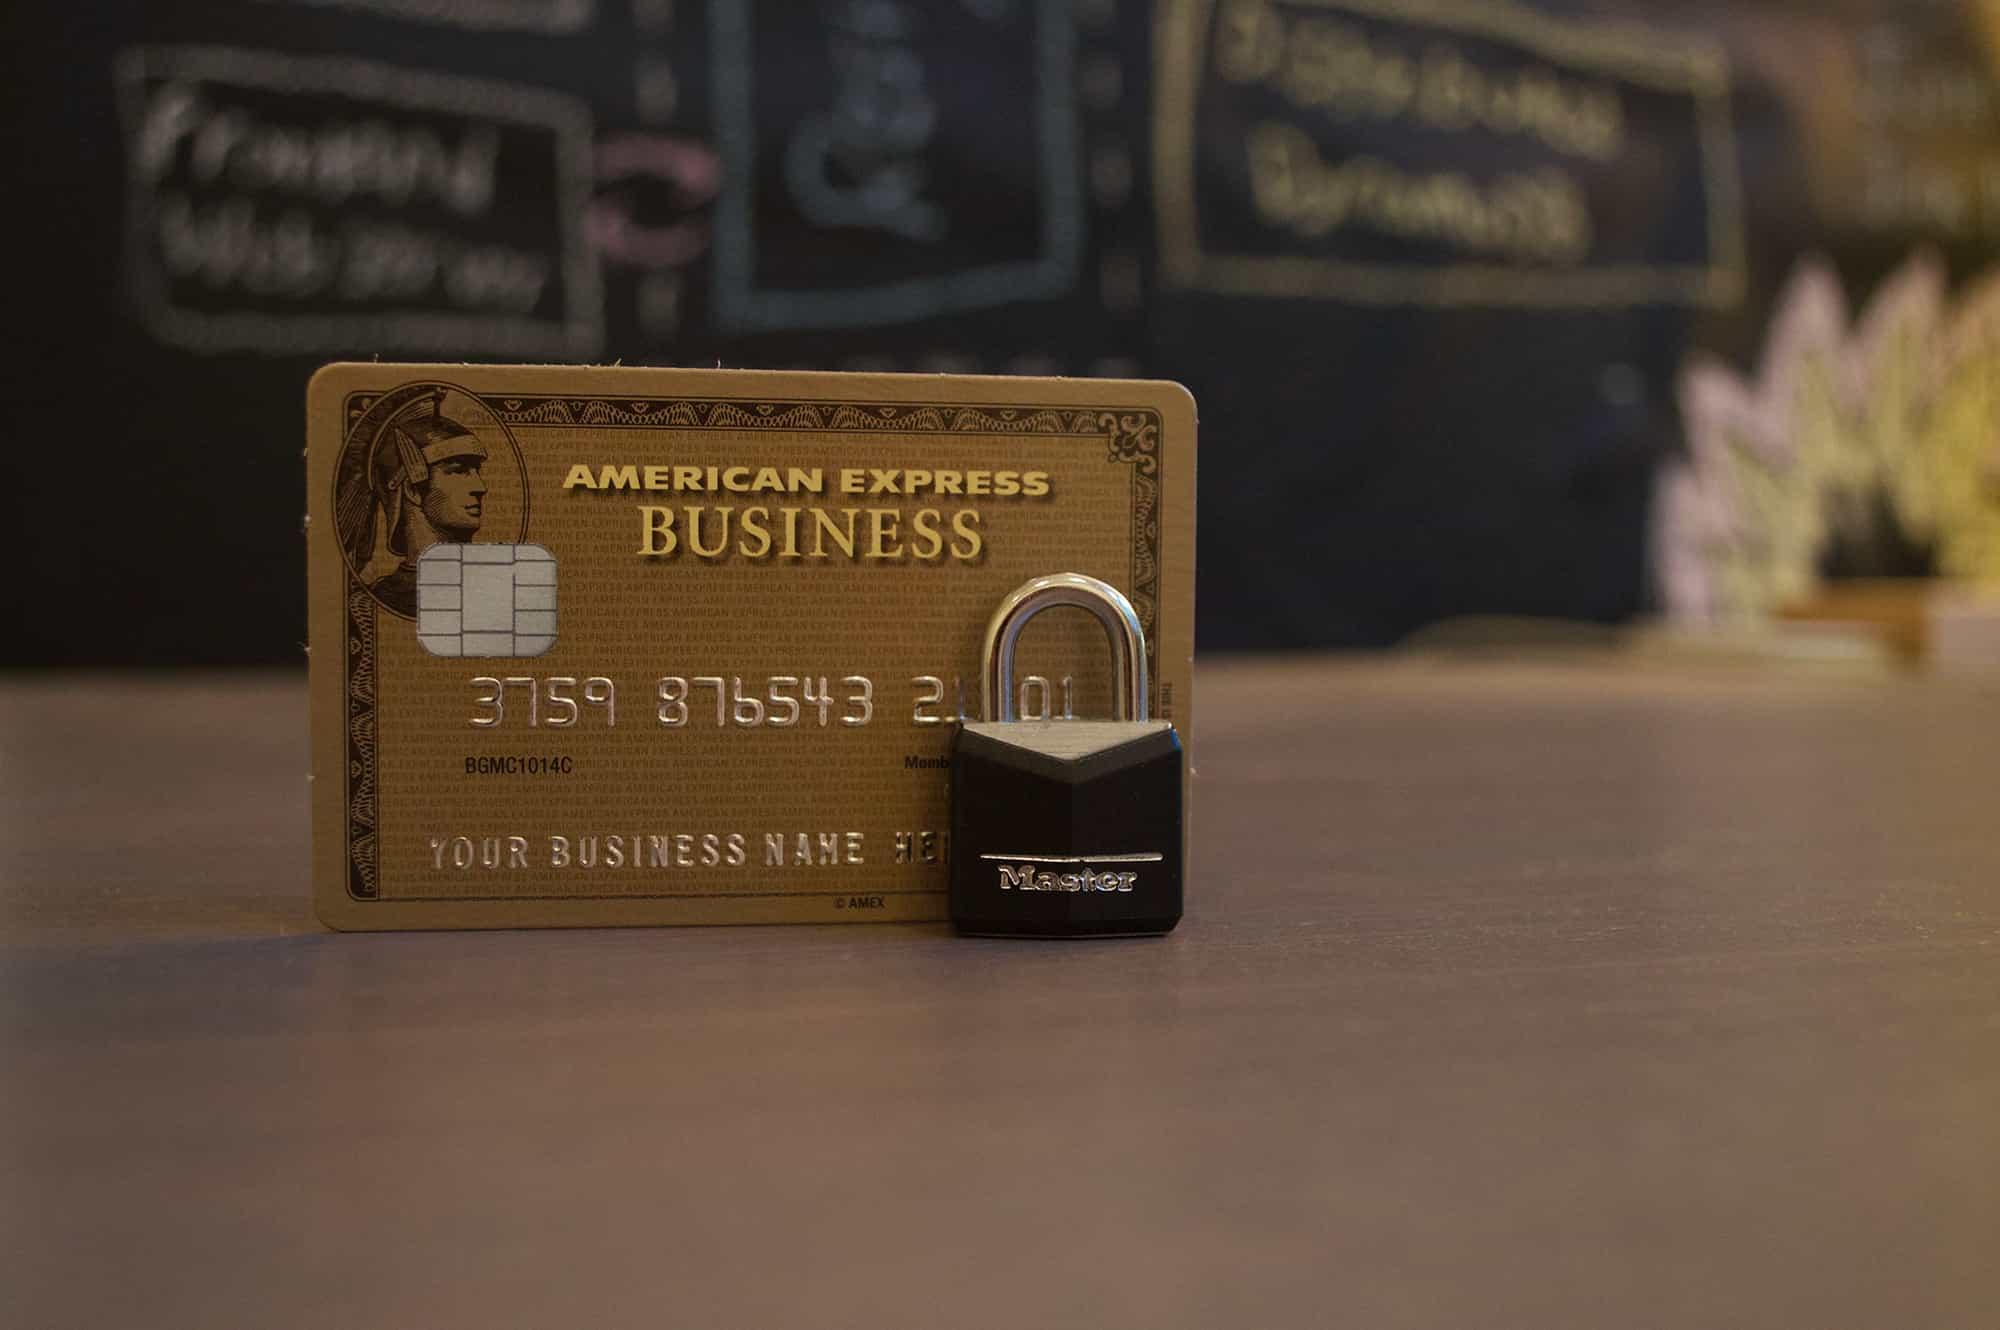 identity-theft-credit-card